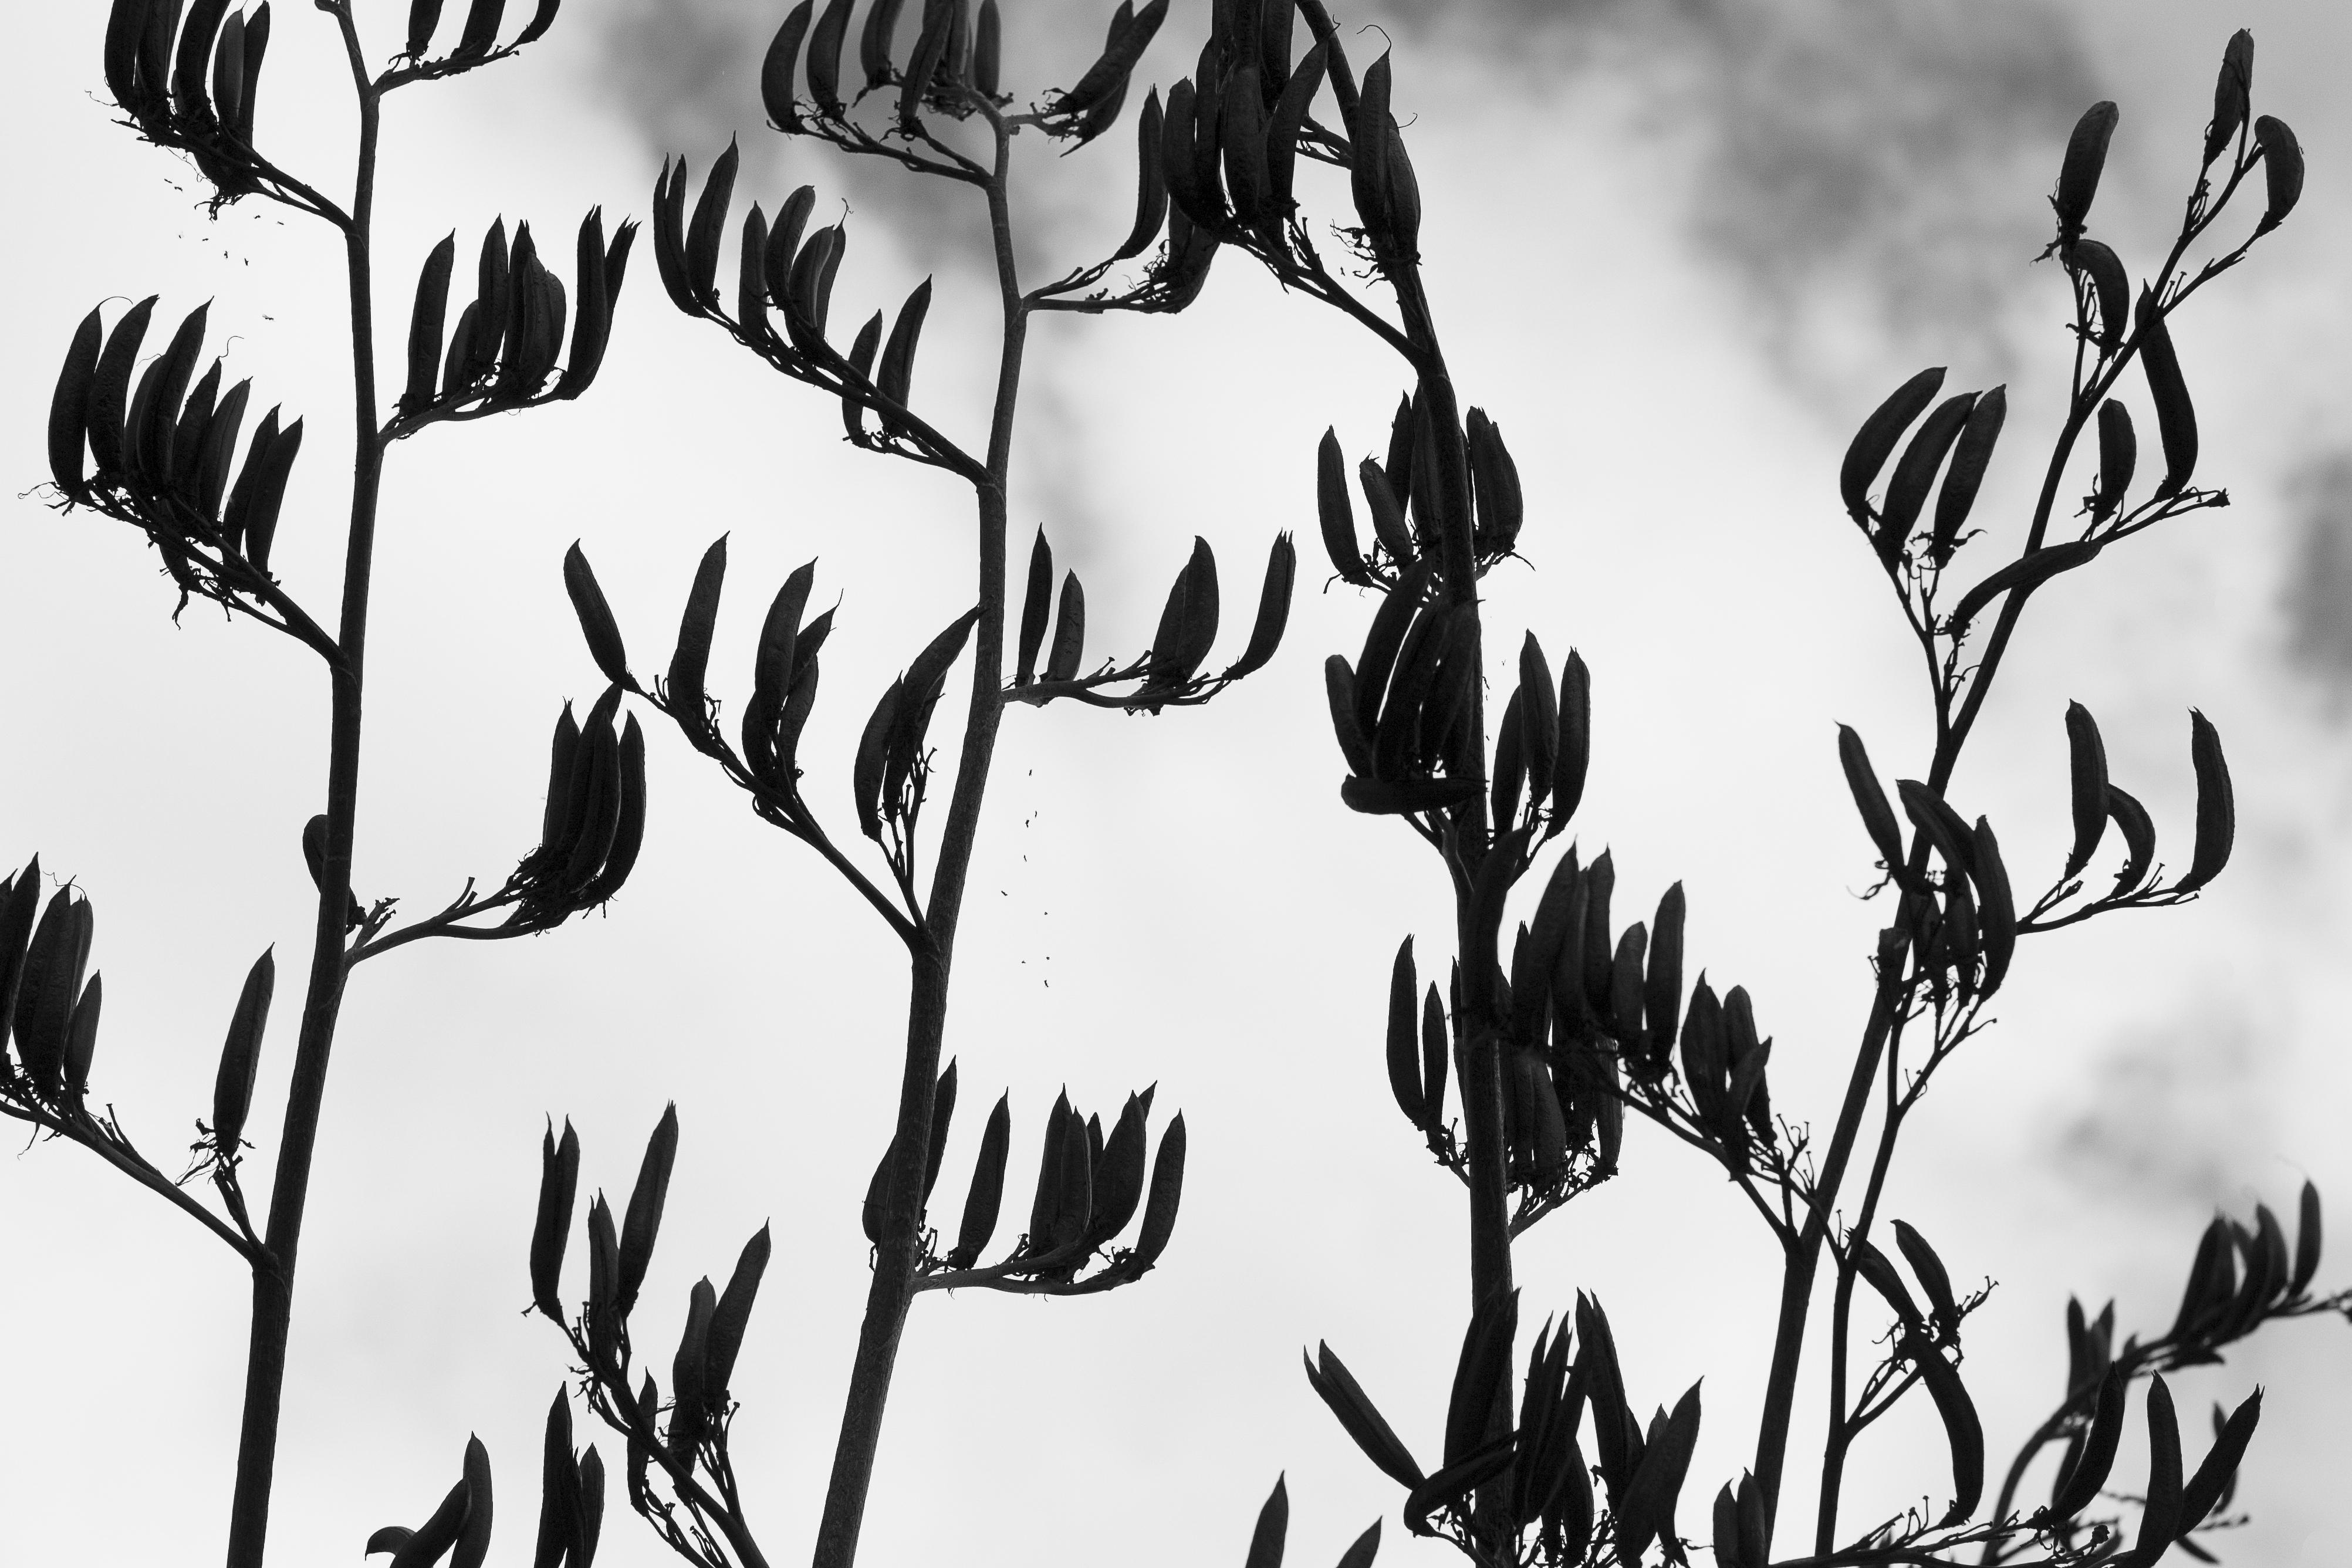 Silhouetted Seeds, Karenia Niedzwiecki